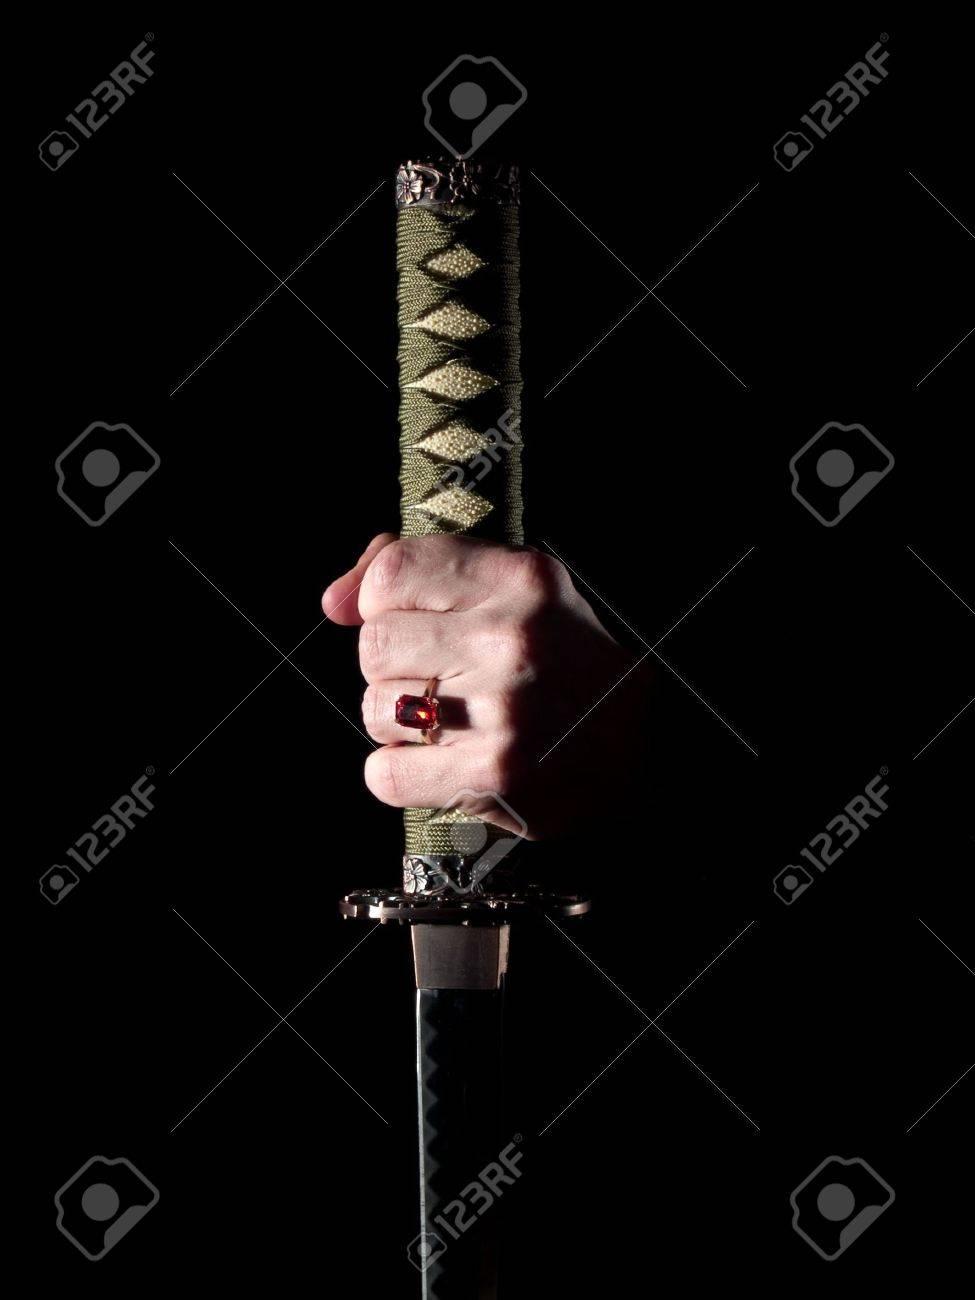 Japanese katana sword in man's hand in darkness - 4295804